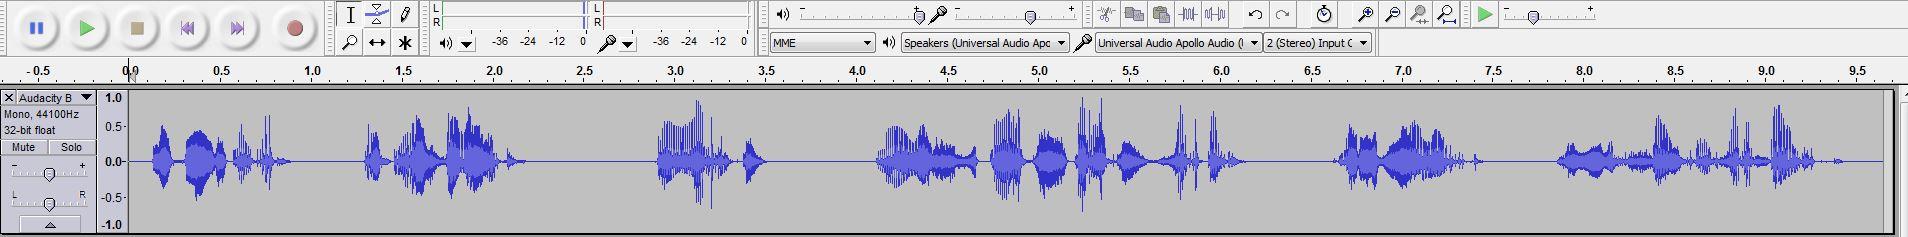 Raw Audio Waveform.JPG